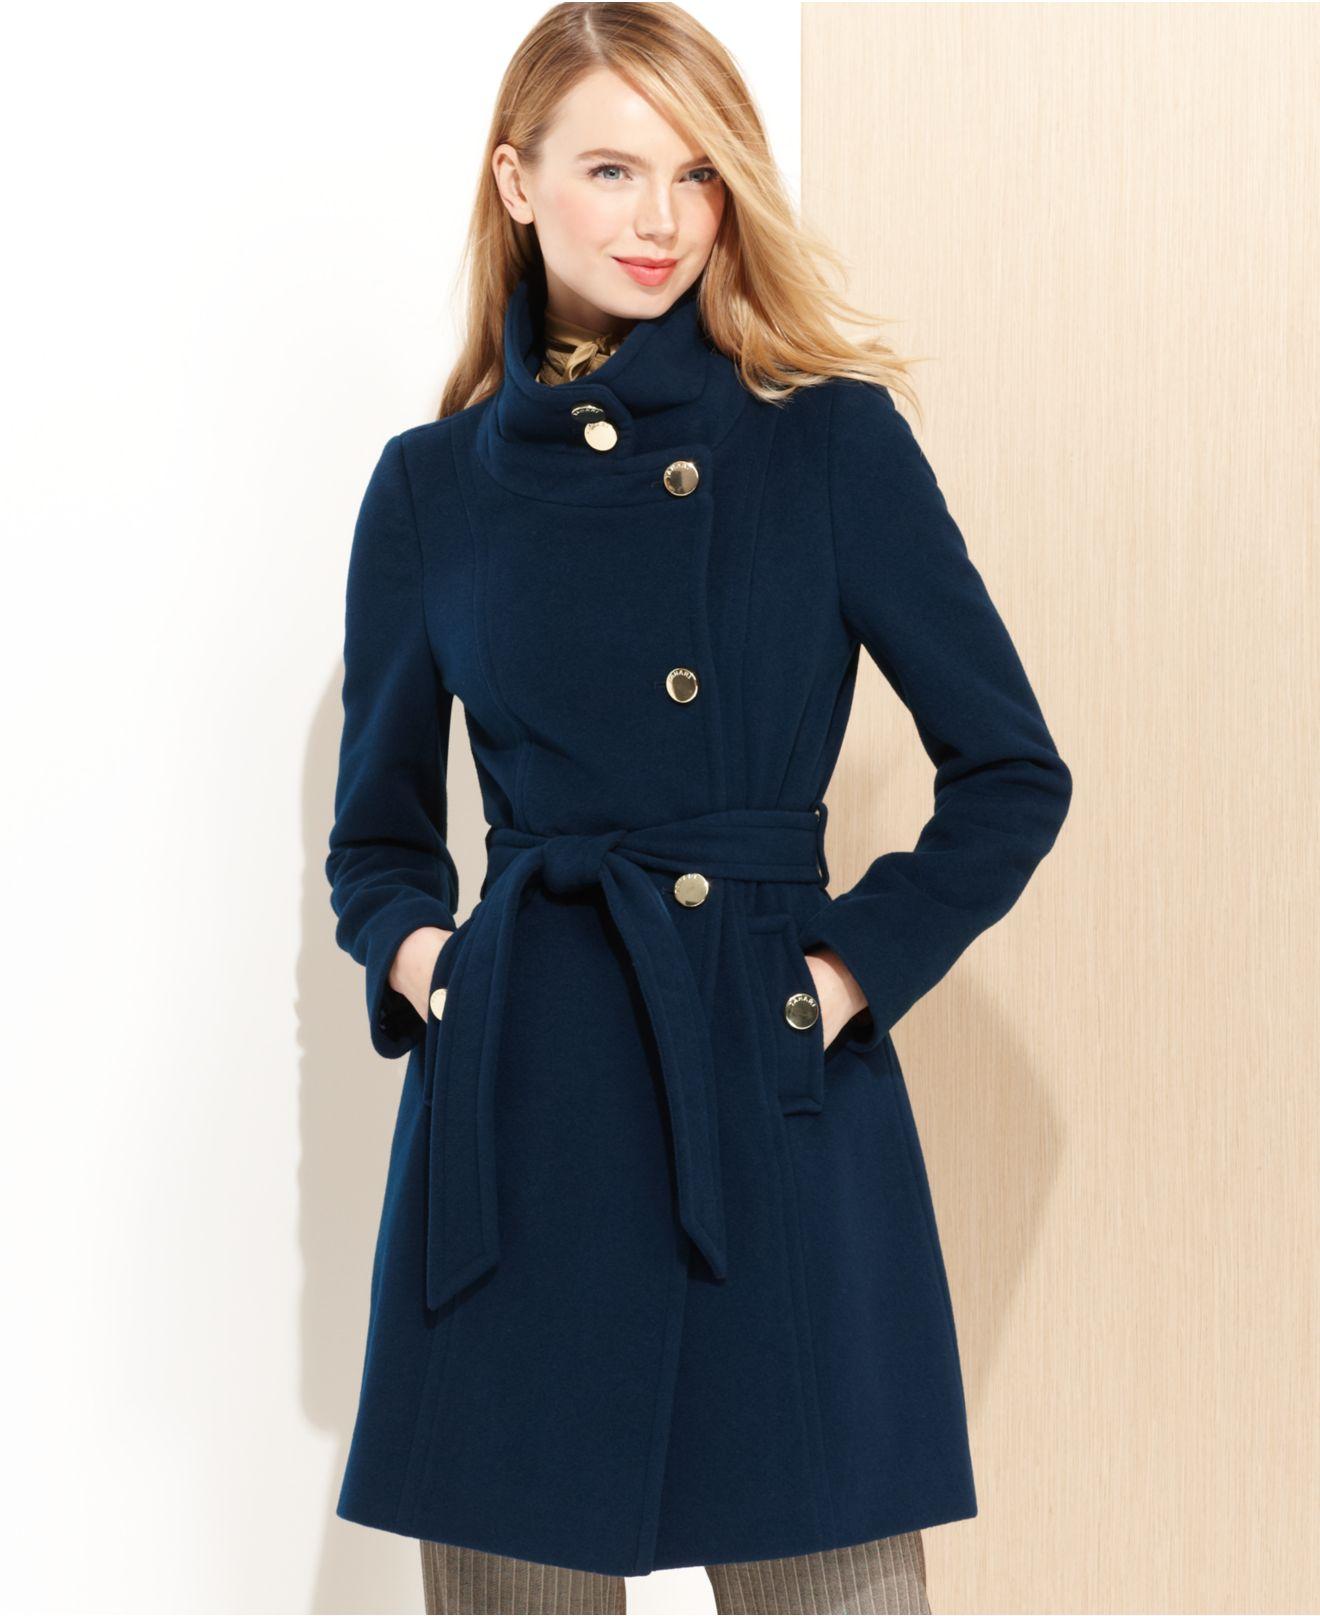 Tahari Izzy Asymmetrical Wool-Blend Coat in Blue | Lyst